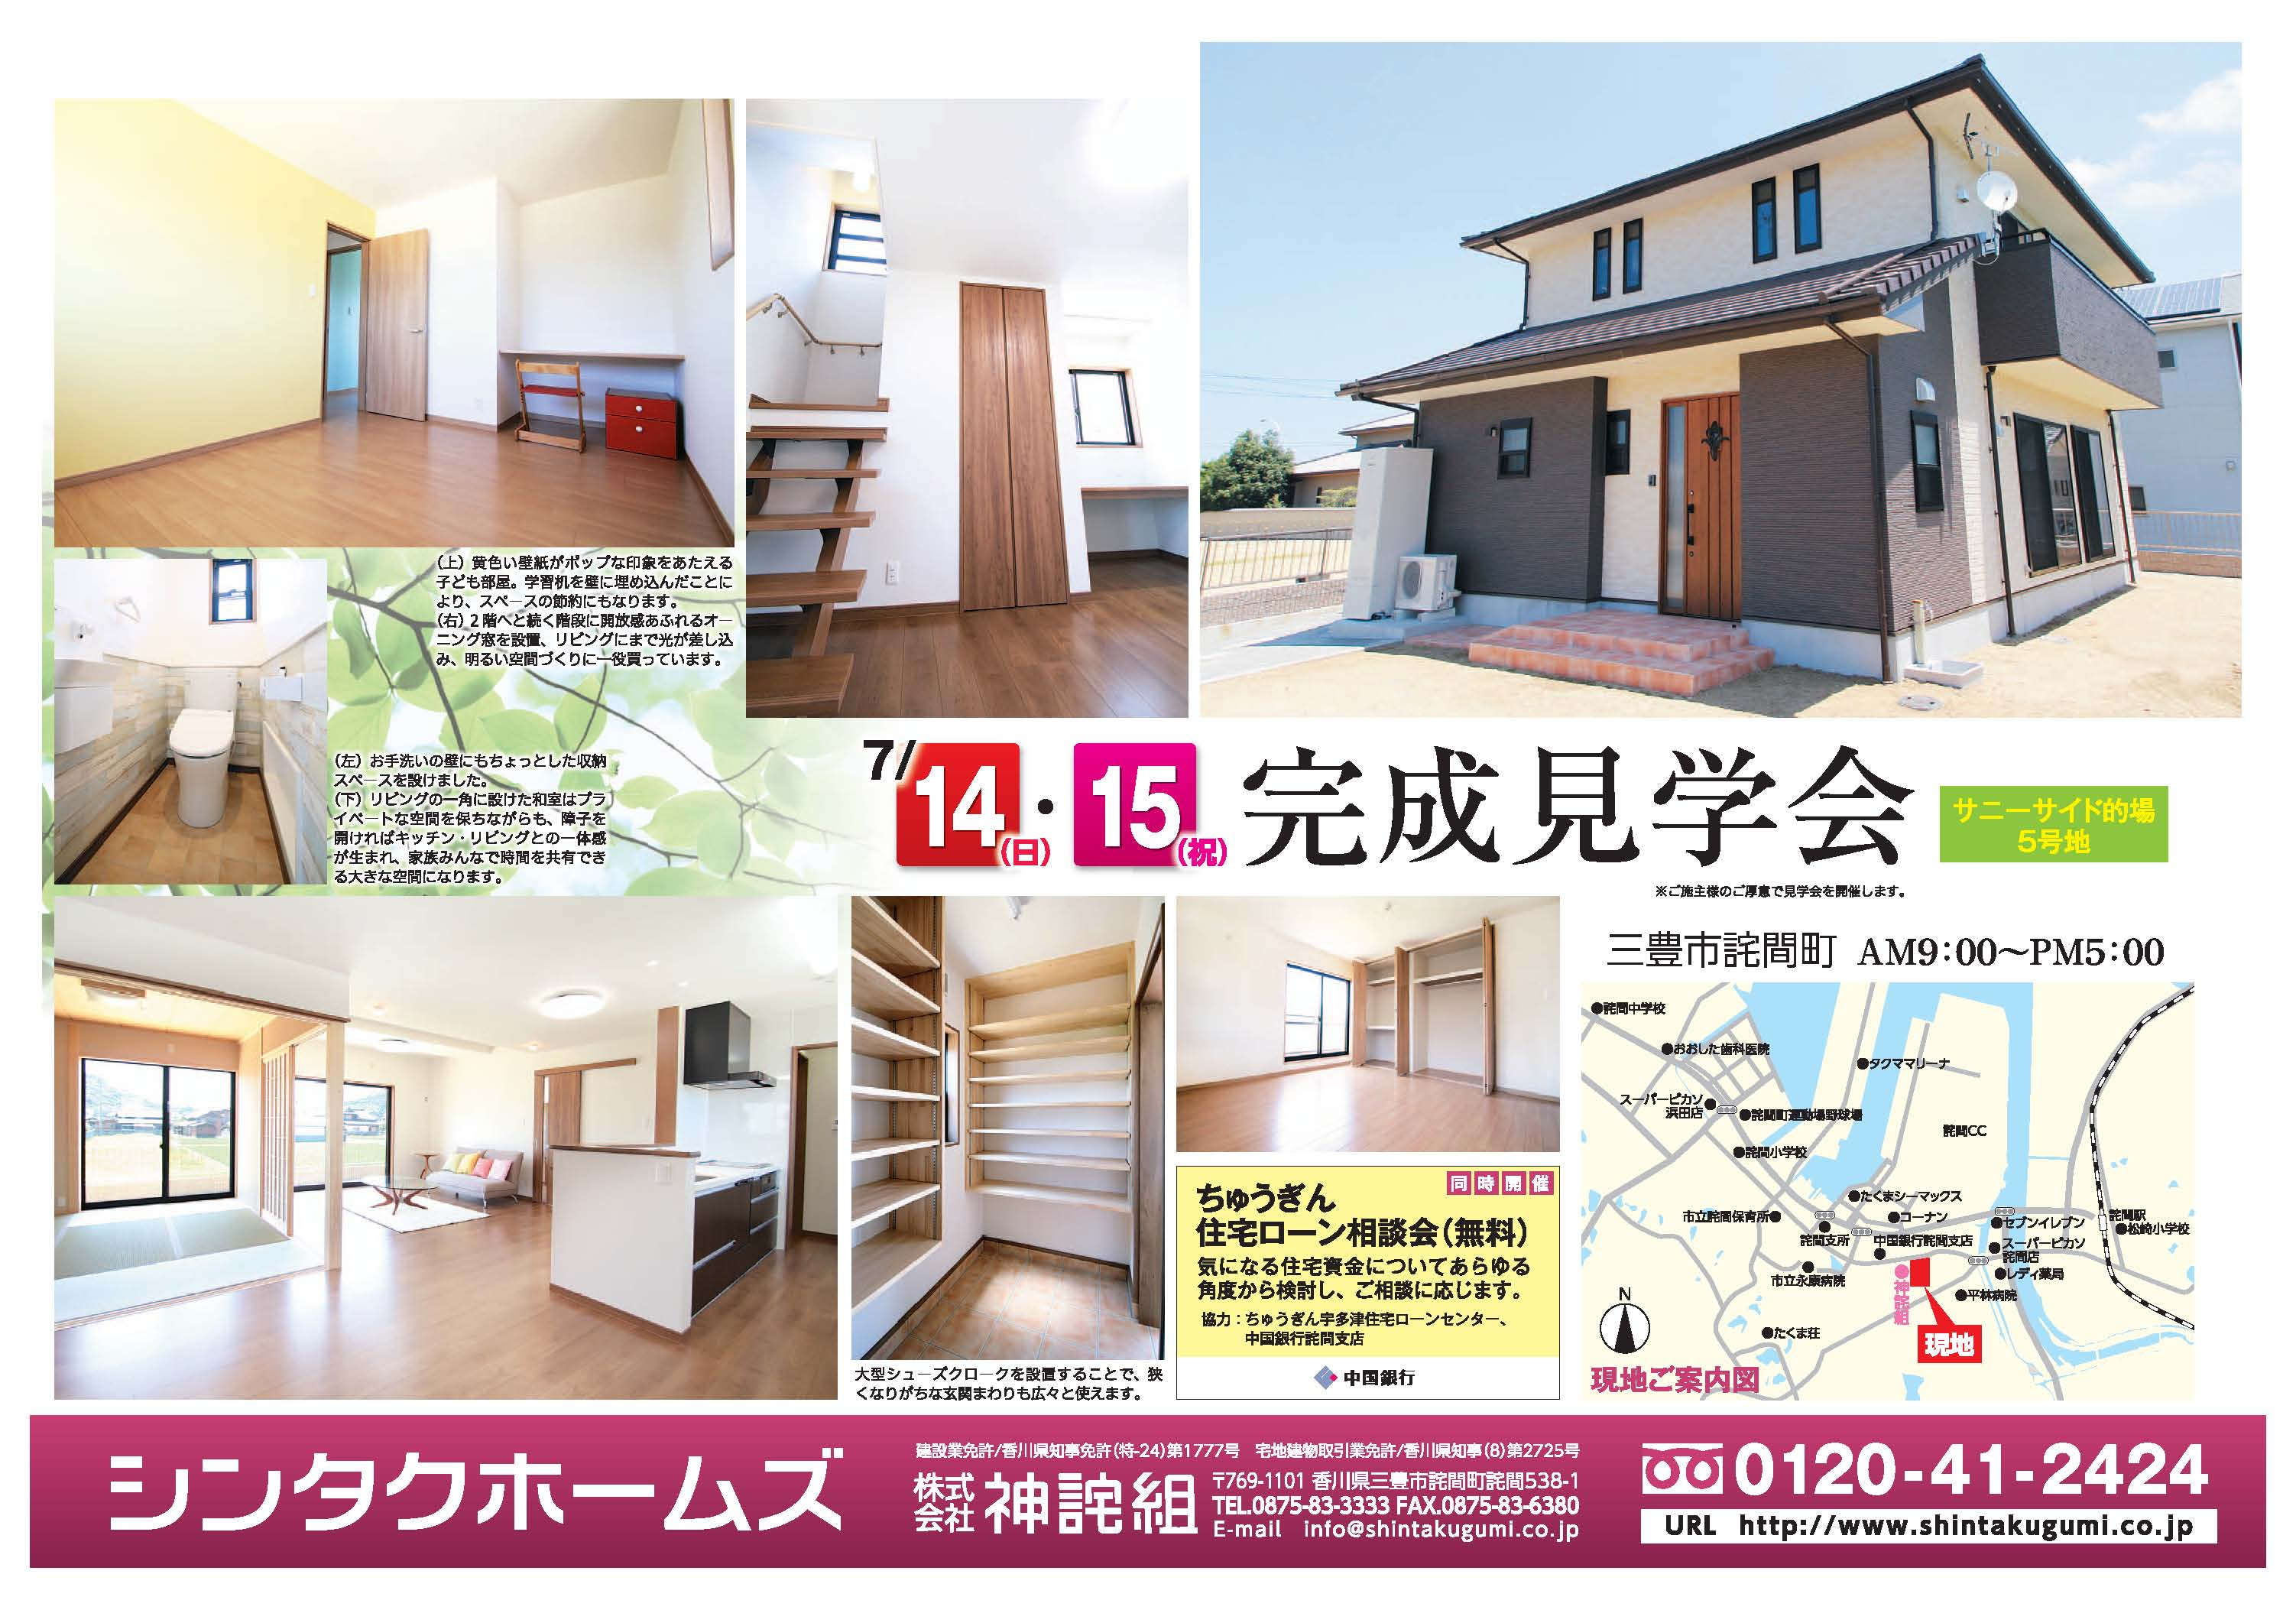 shintakugumi_omote5.jpg